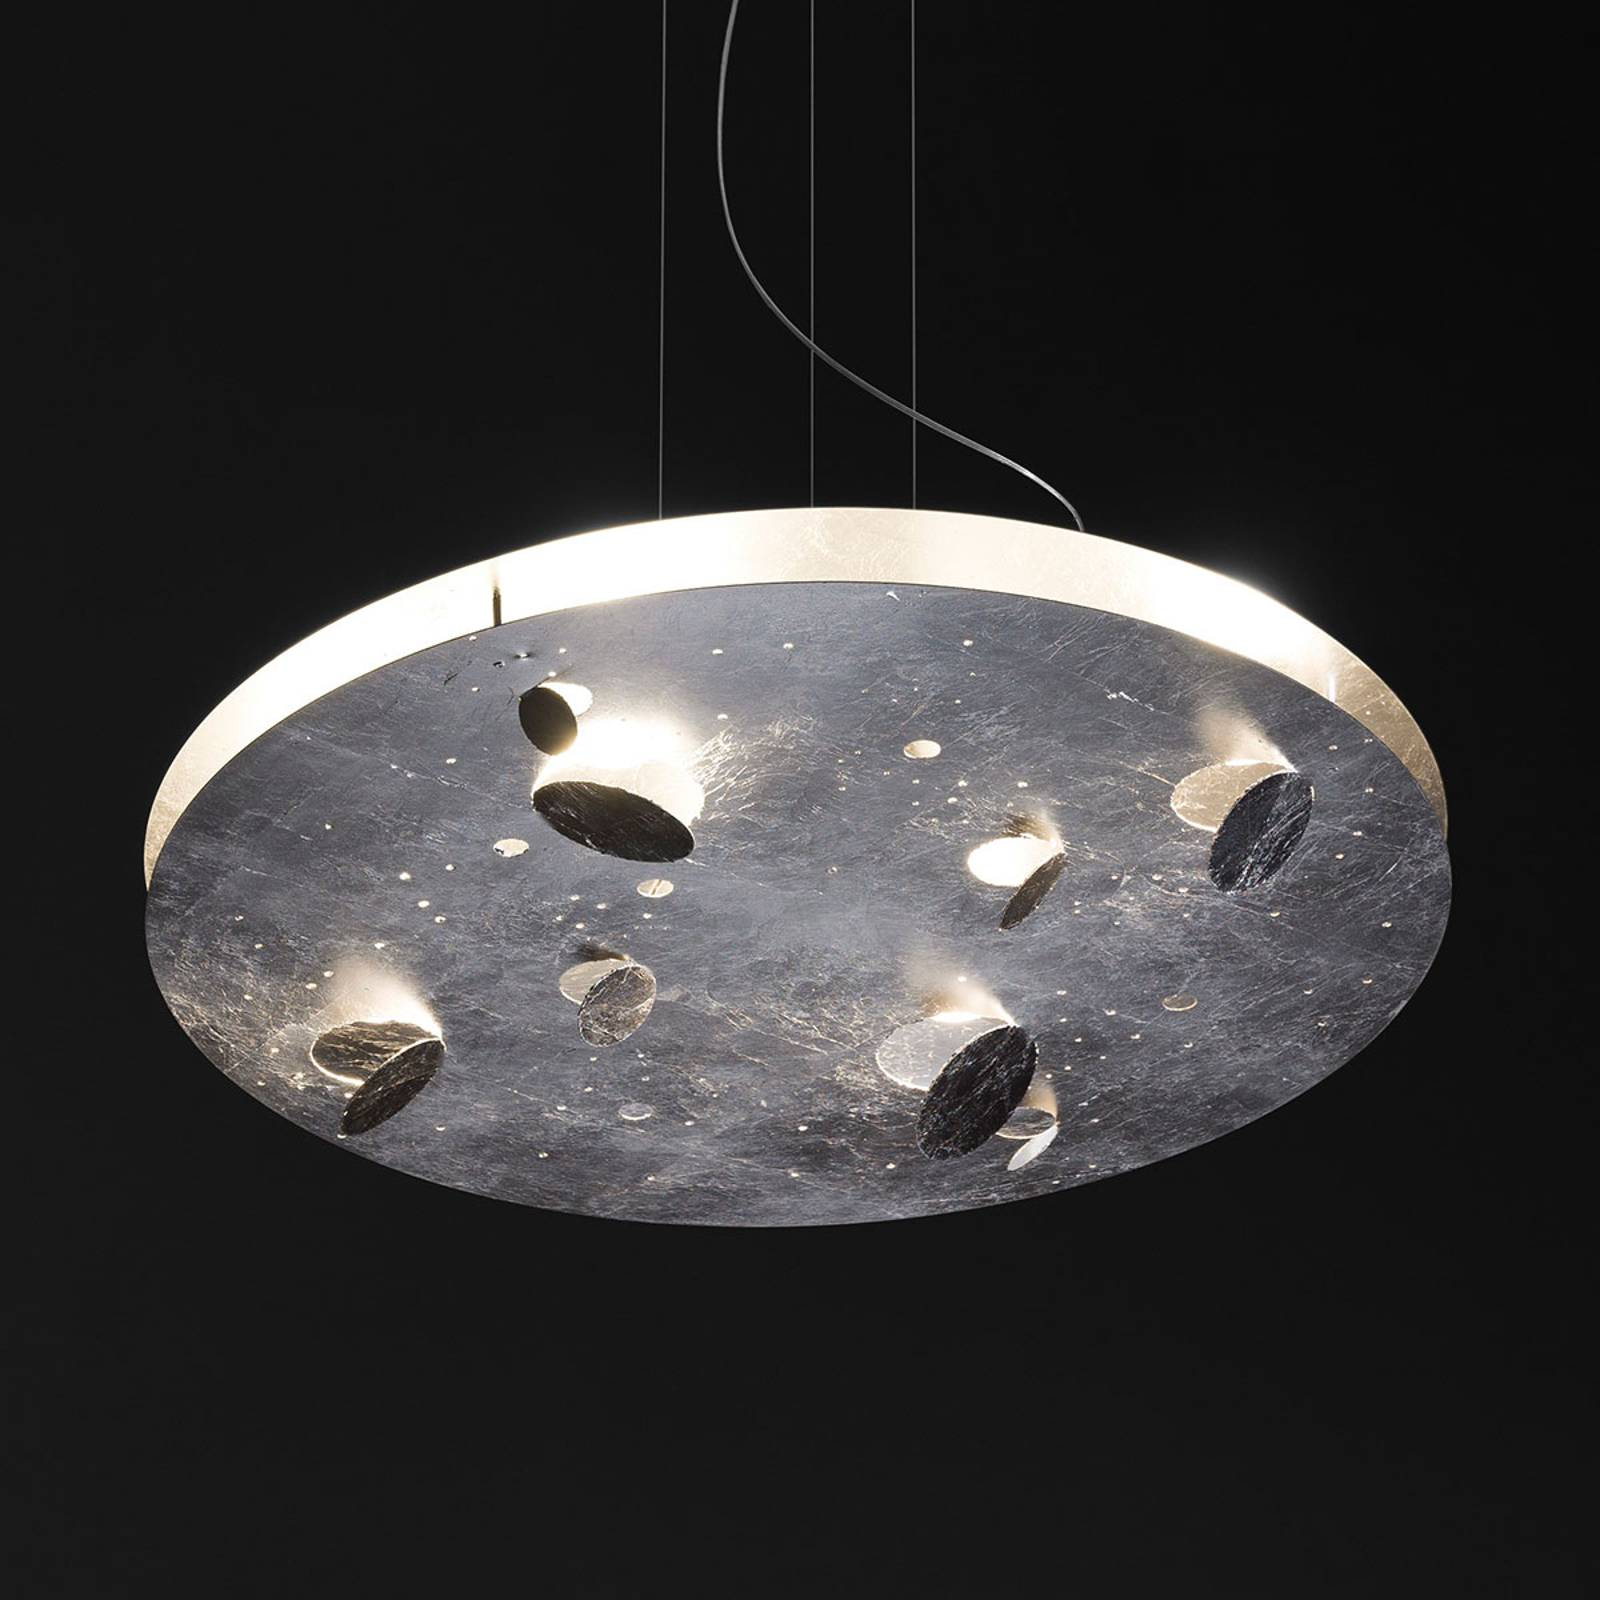 Knikerboker Buchi lampa wisząca LED okrągła srebro